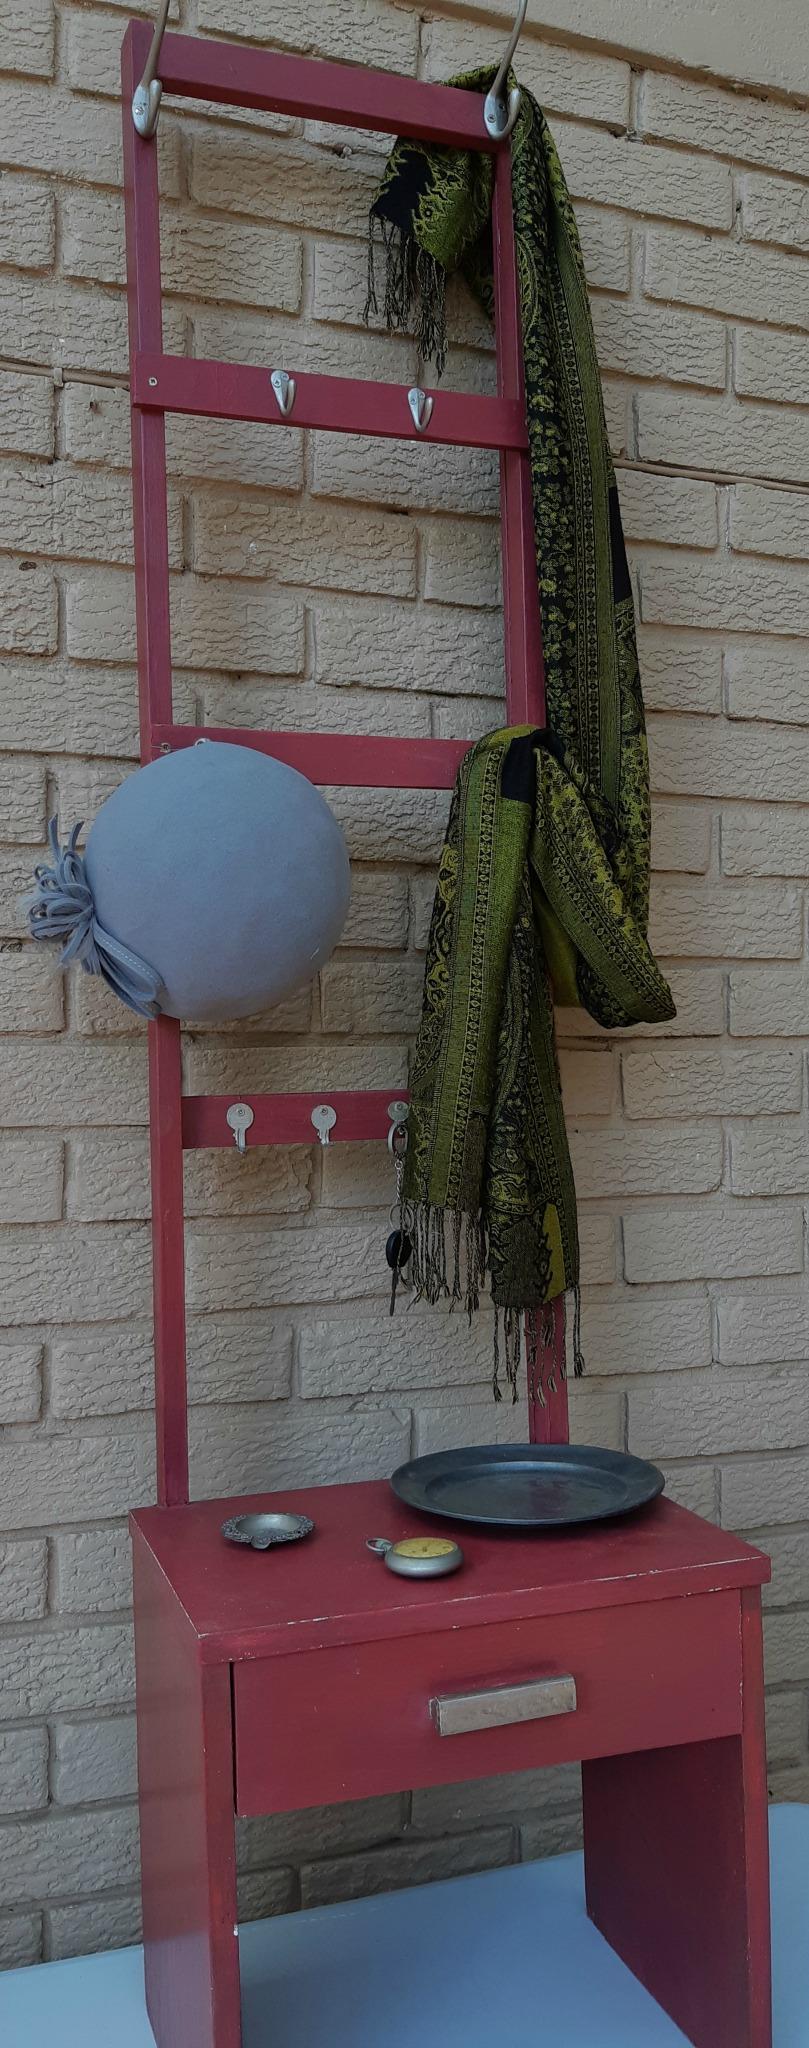 Coat hanger a